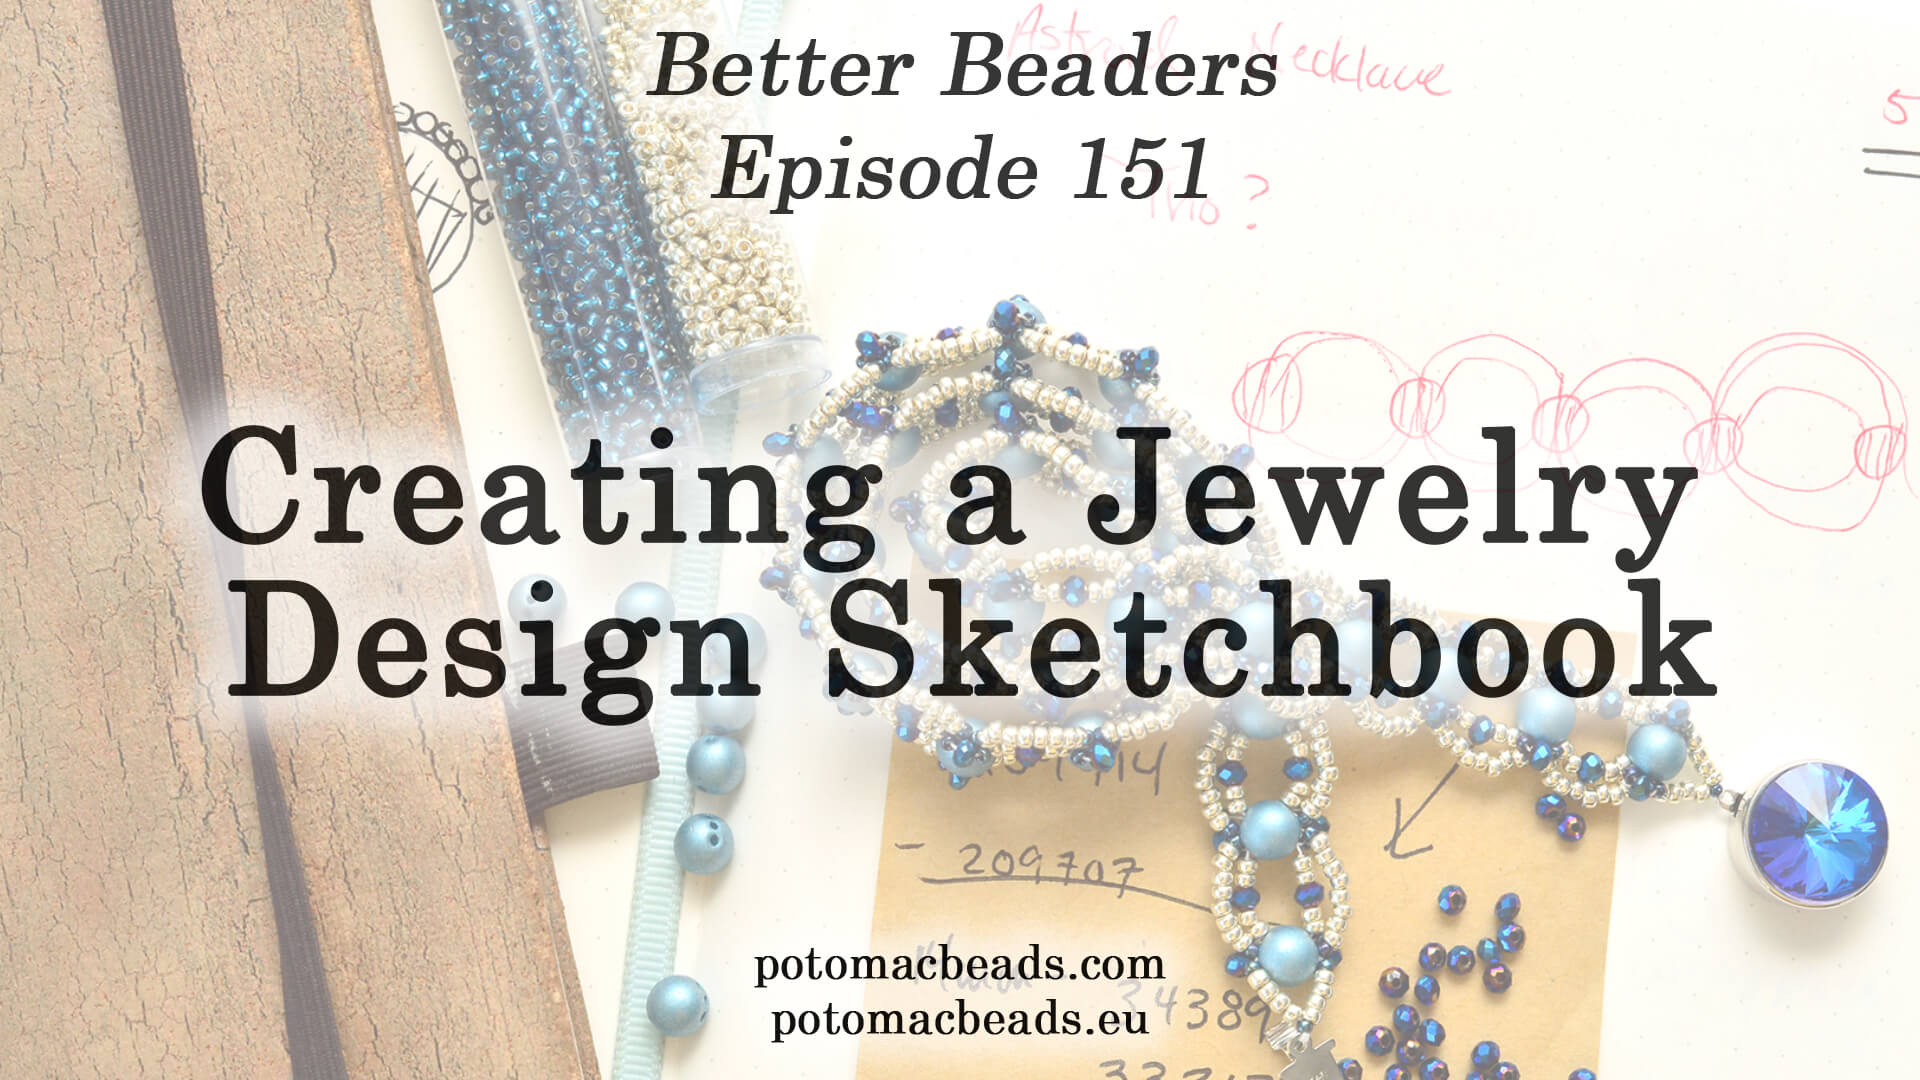 How to Bead / Better Beader Episodes / Better Beader Episode 151 - Creating a Jewelry Design Sketchbook